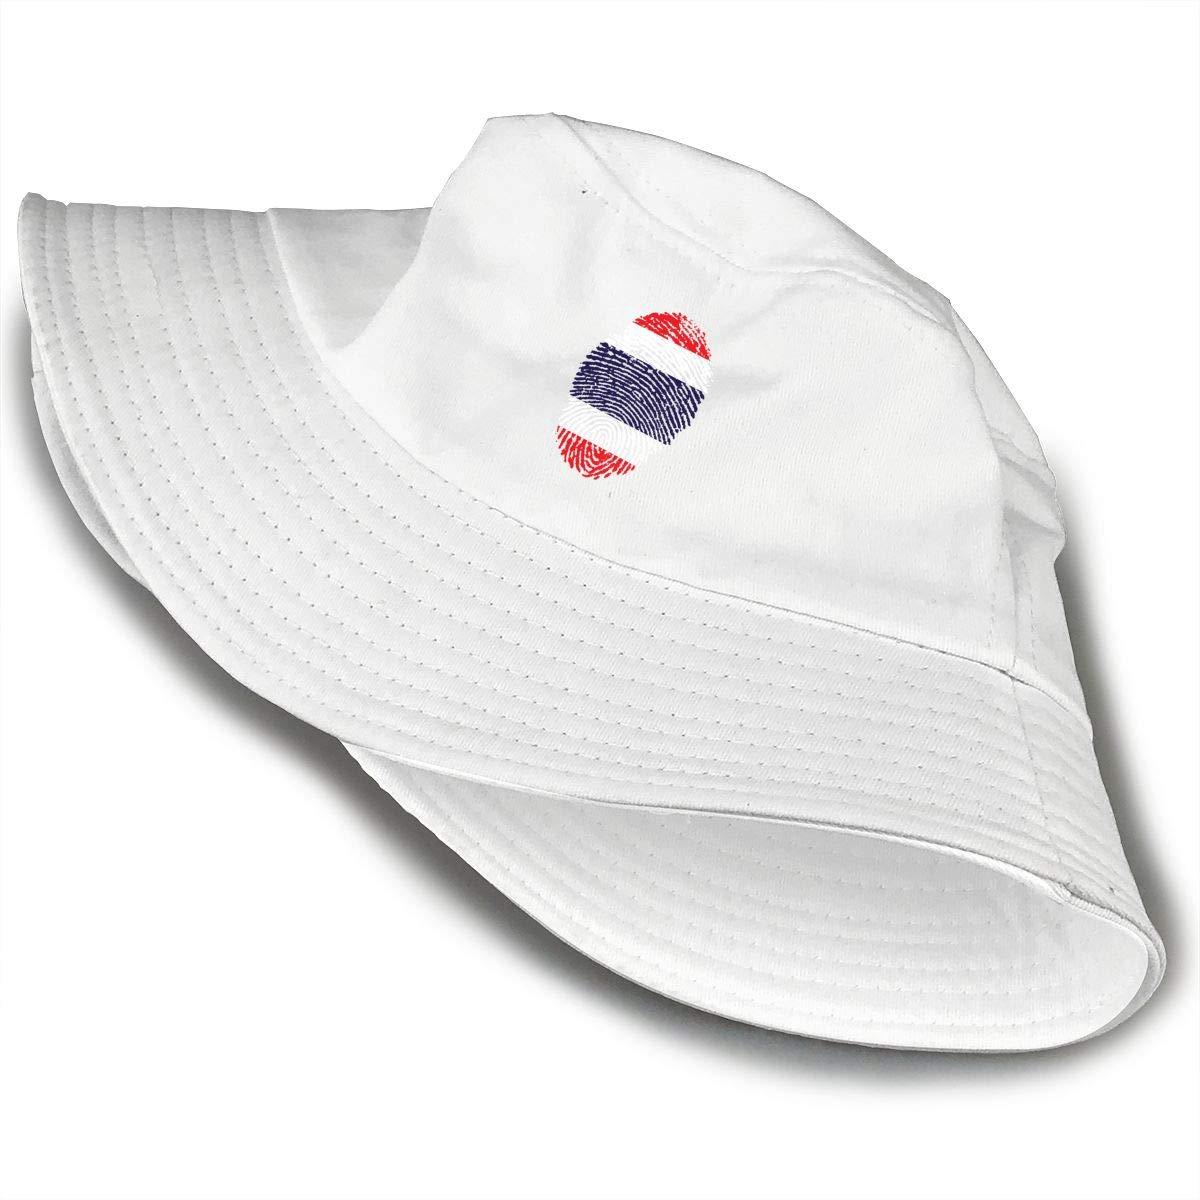 NDFGR Thailand Unisex Cotton Packable Black Travel Bucket Hat Fishing Cap